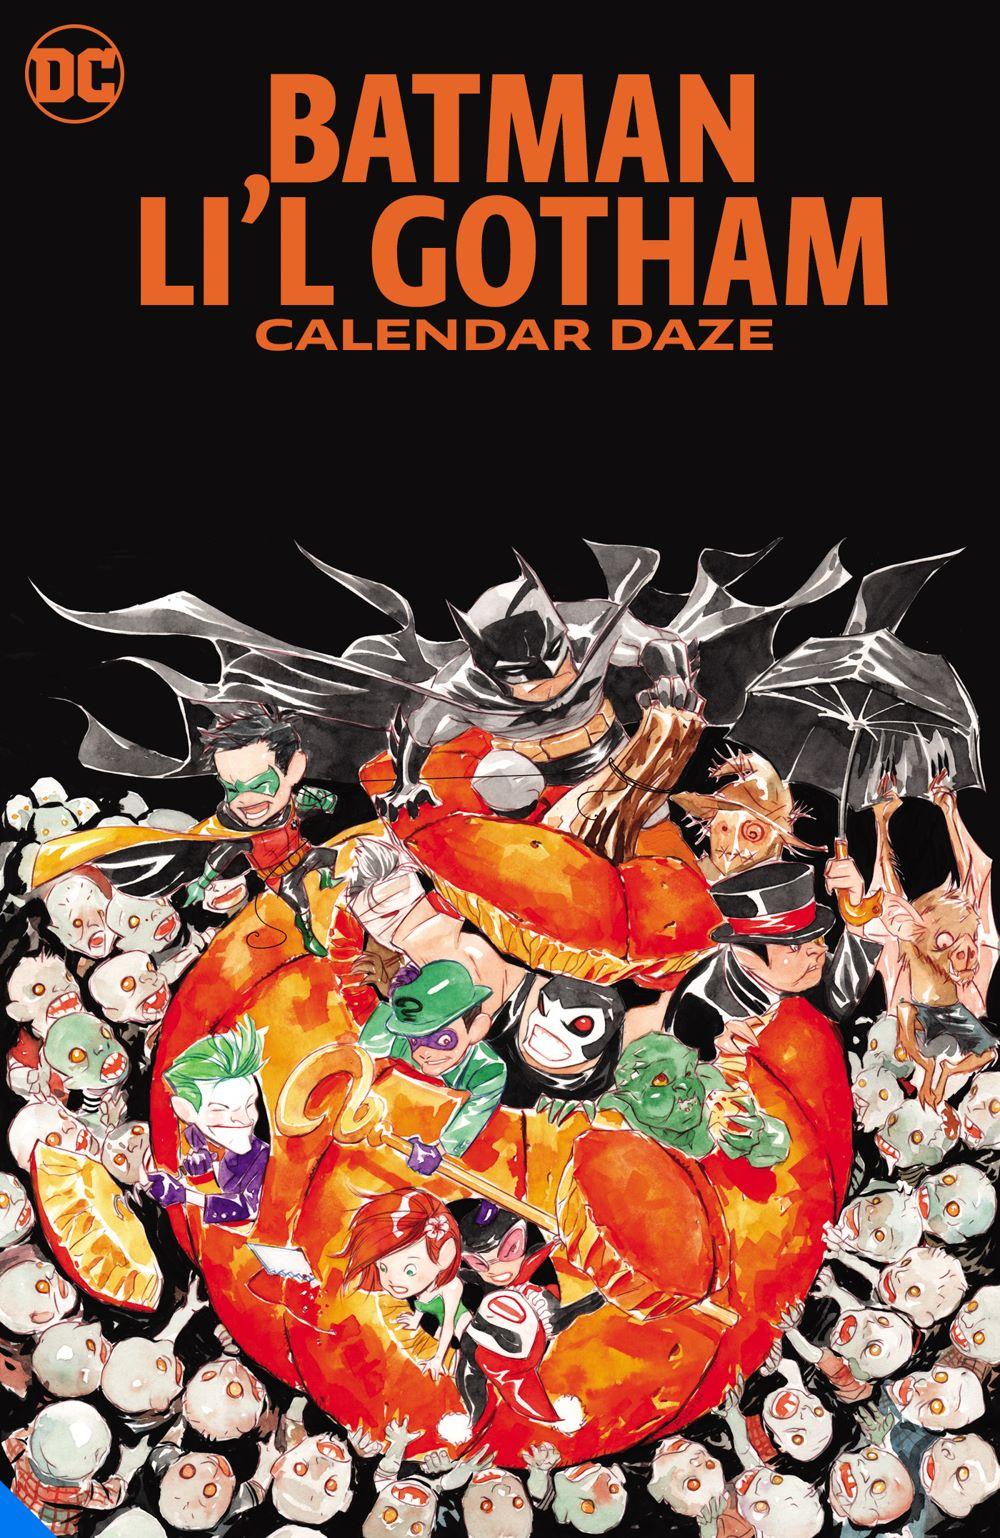 batmanlilgothamcalednardaze_adv DC Comics August 2021 Solicitations